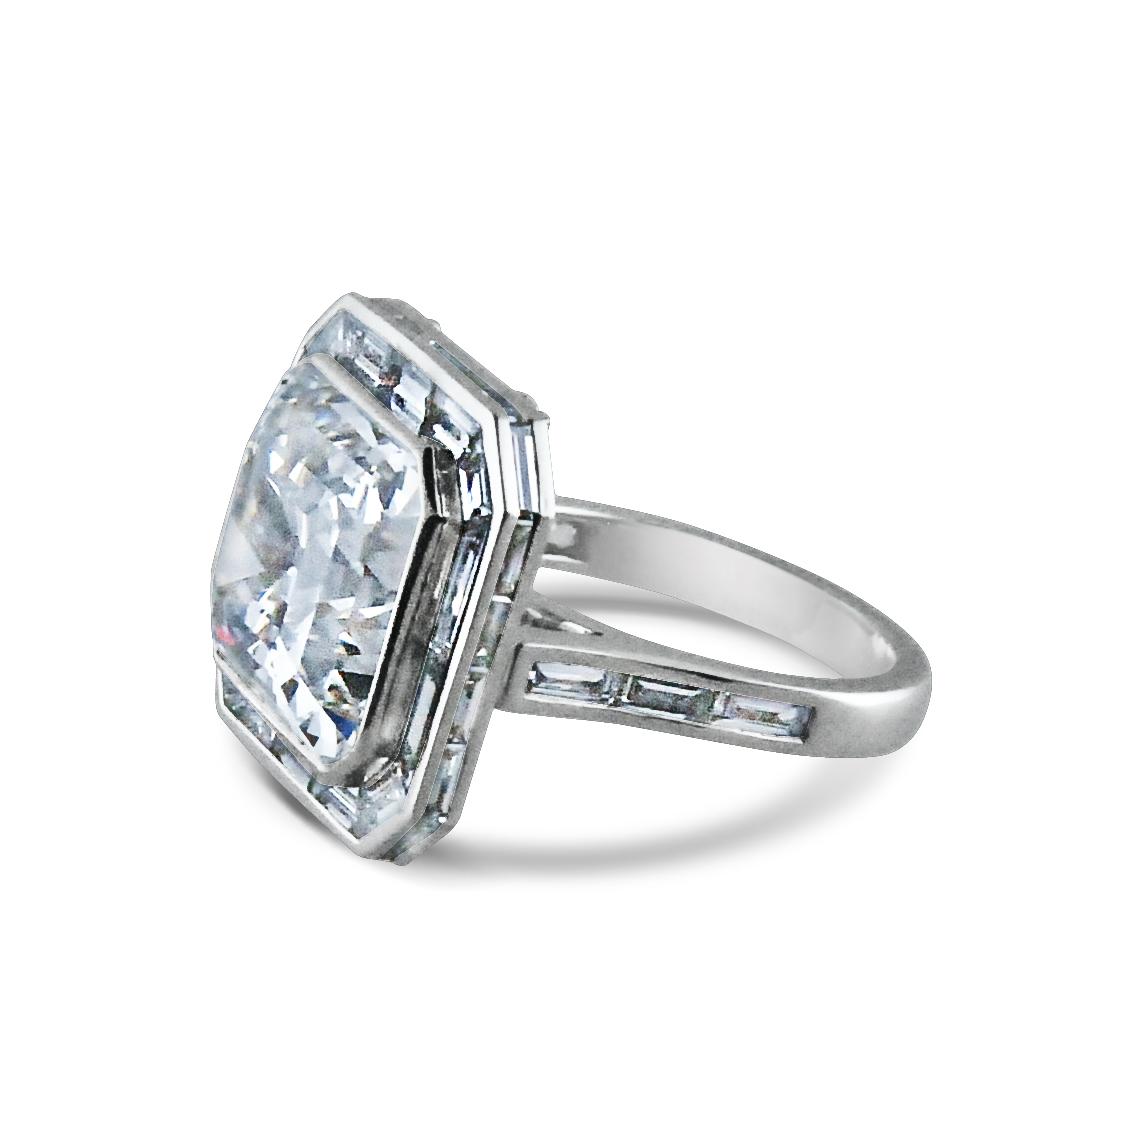 10.62ct-step-cut-diamond-and-platinum-ring-1.jpg